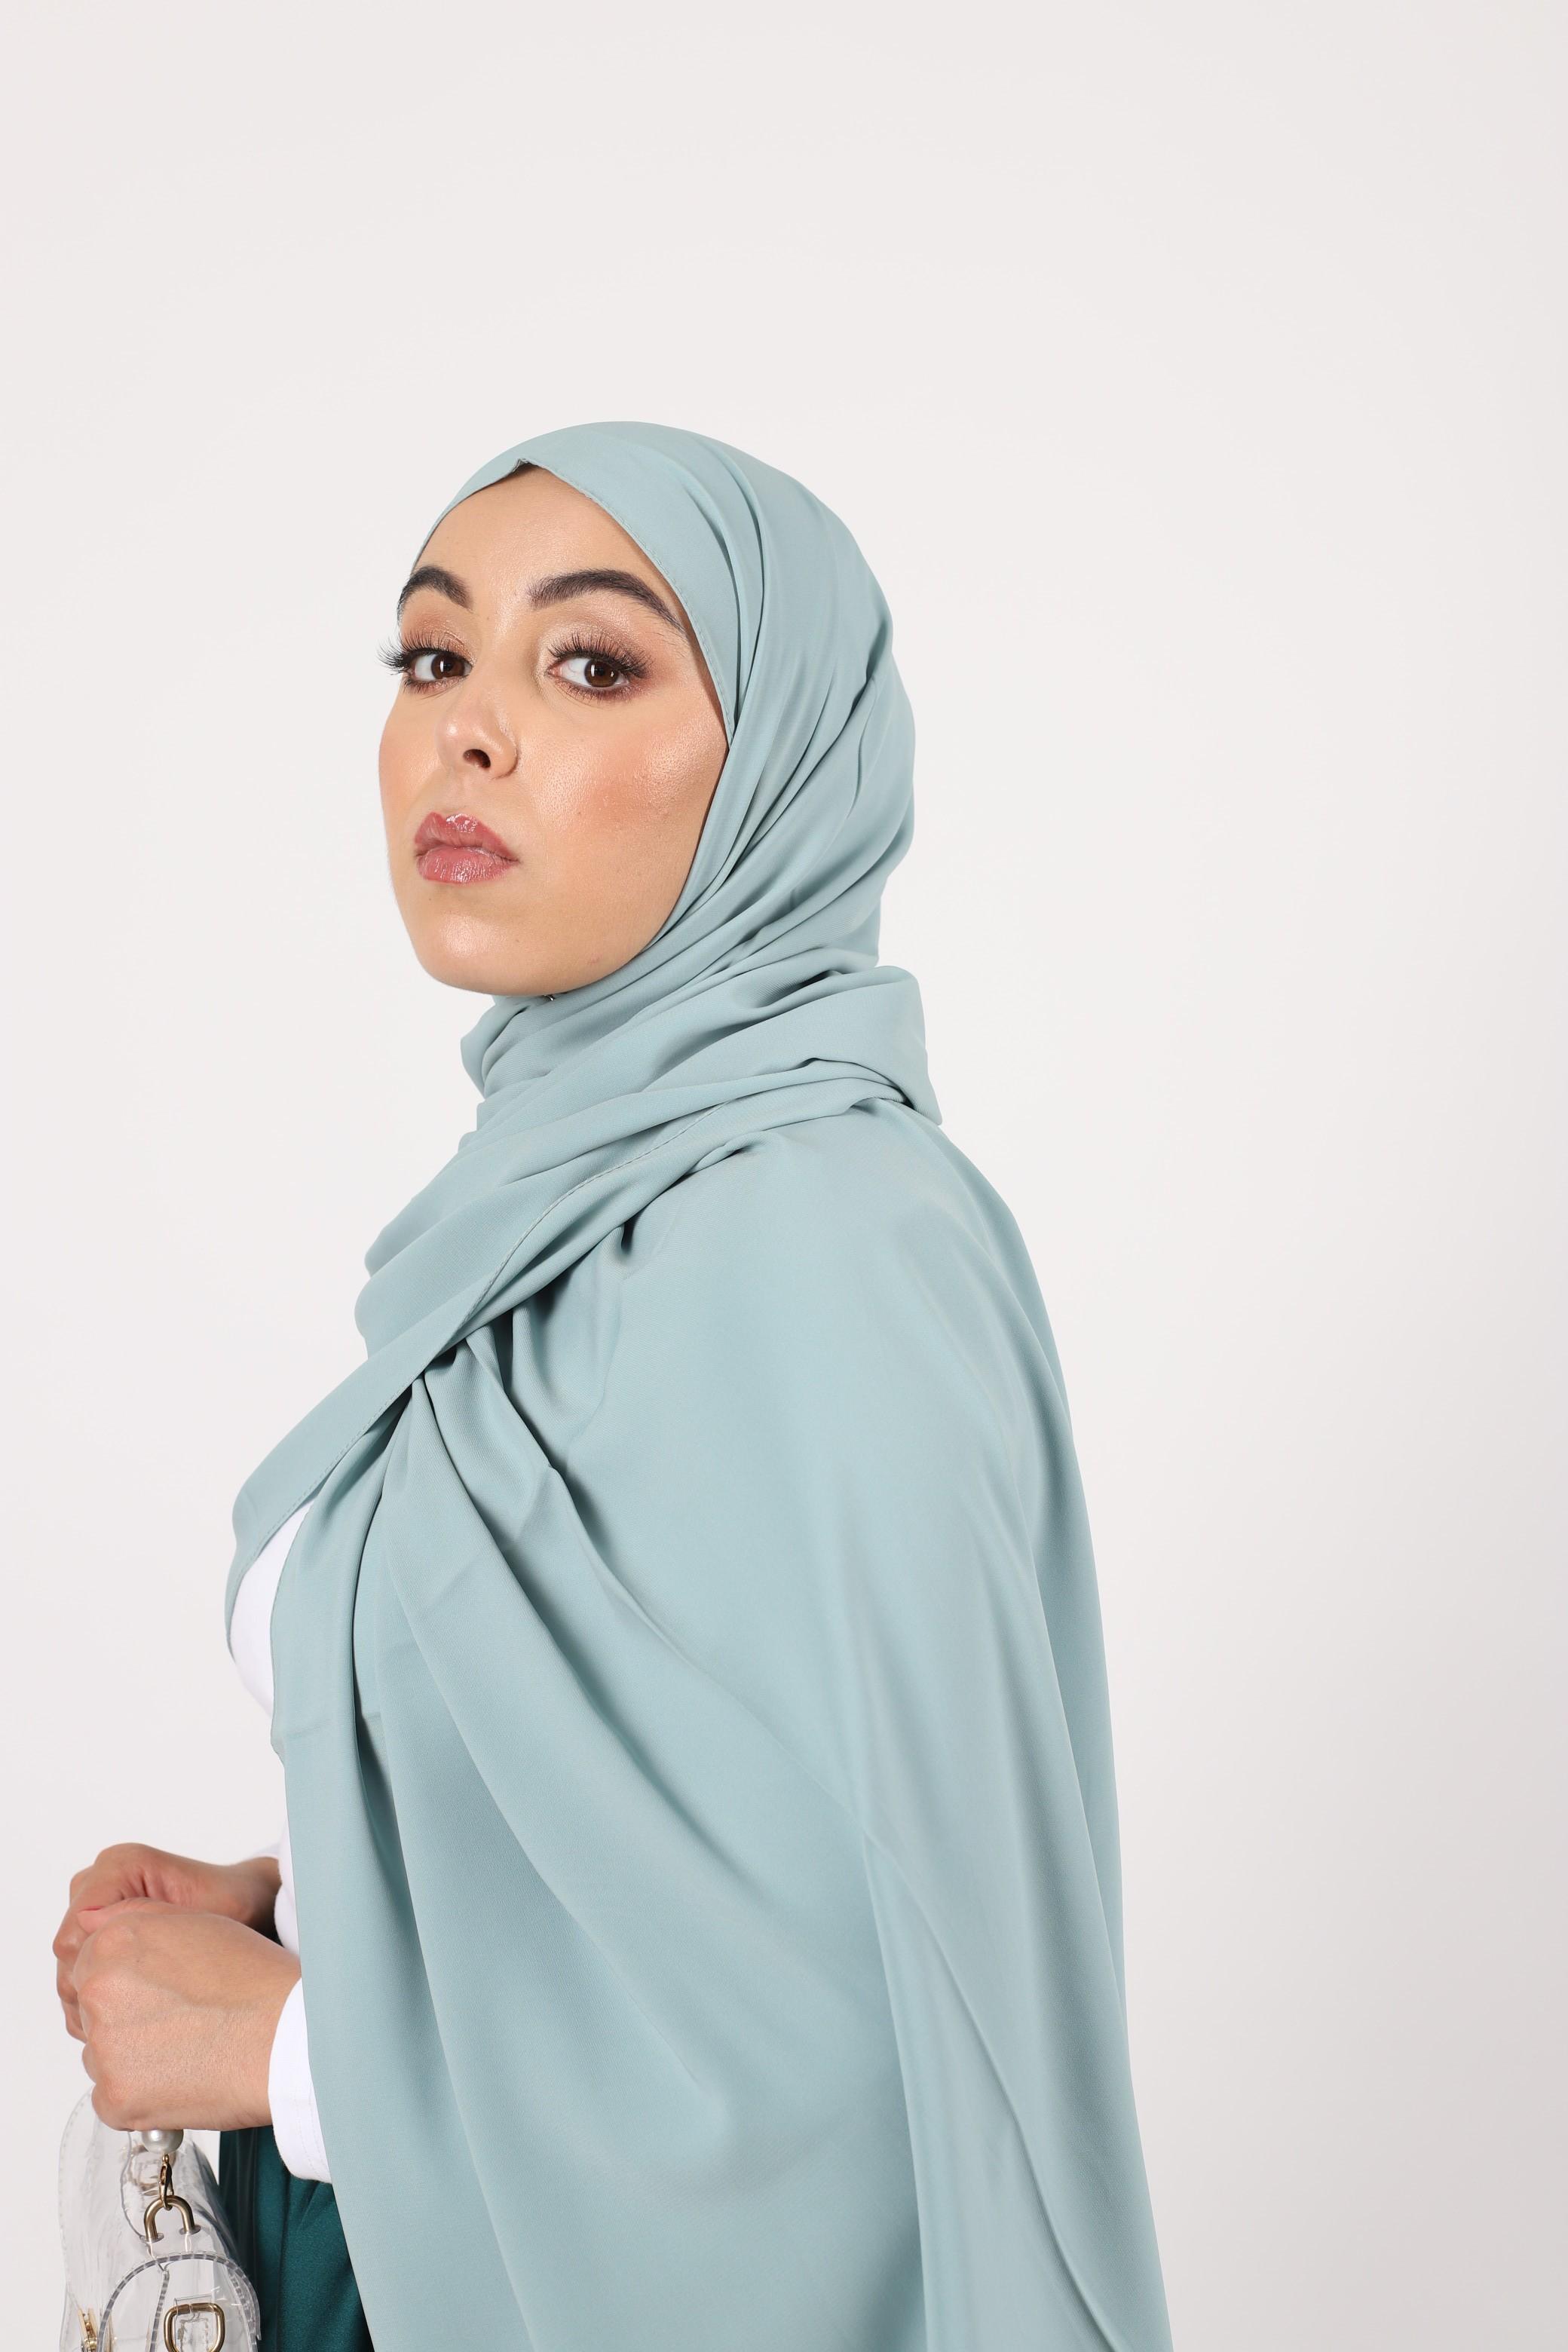 Hijab soie de medine menthe